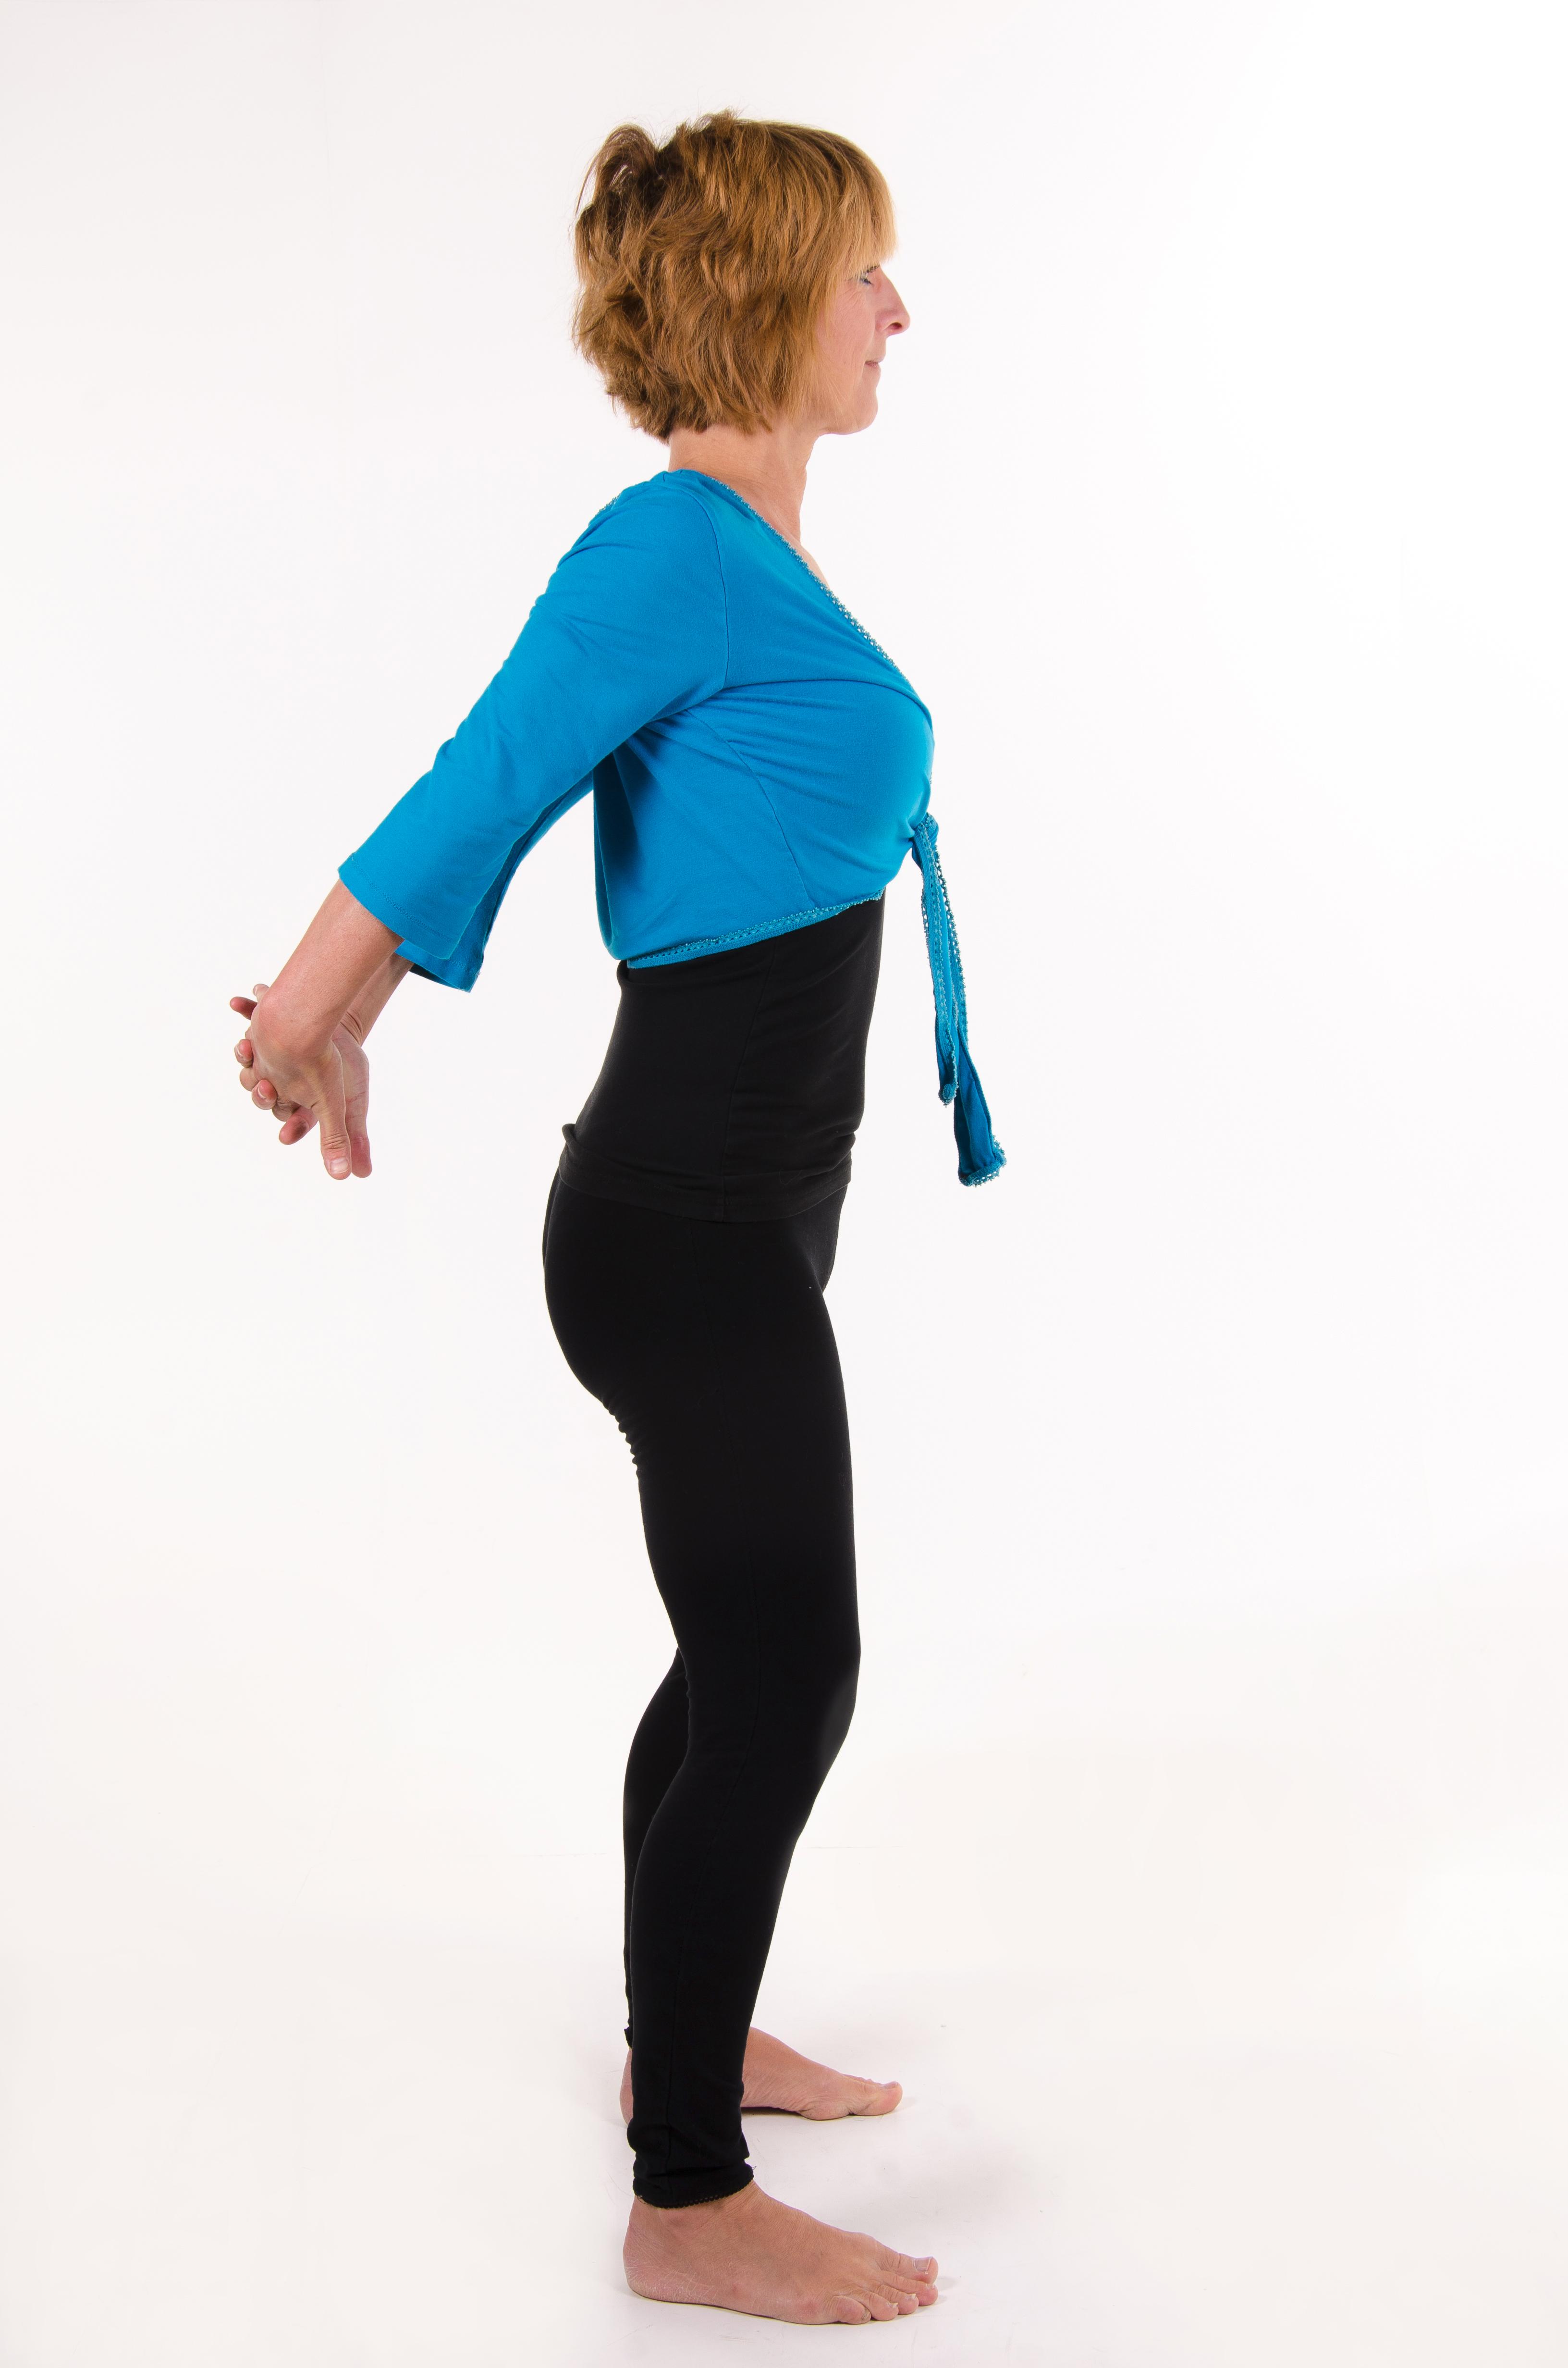 Stretching-7982